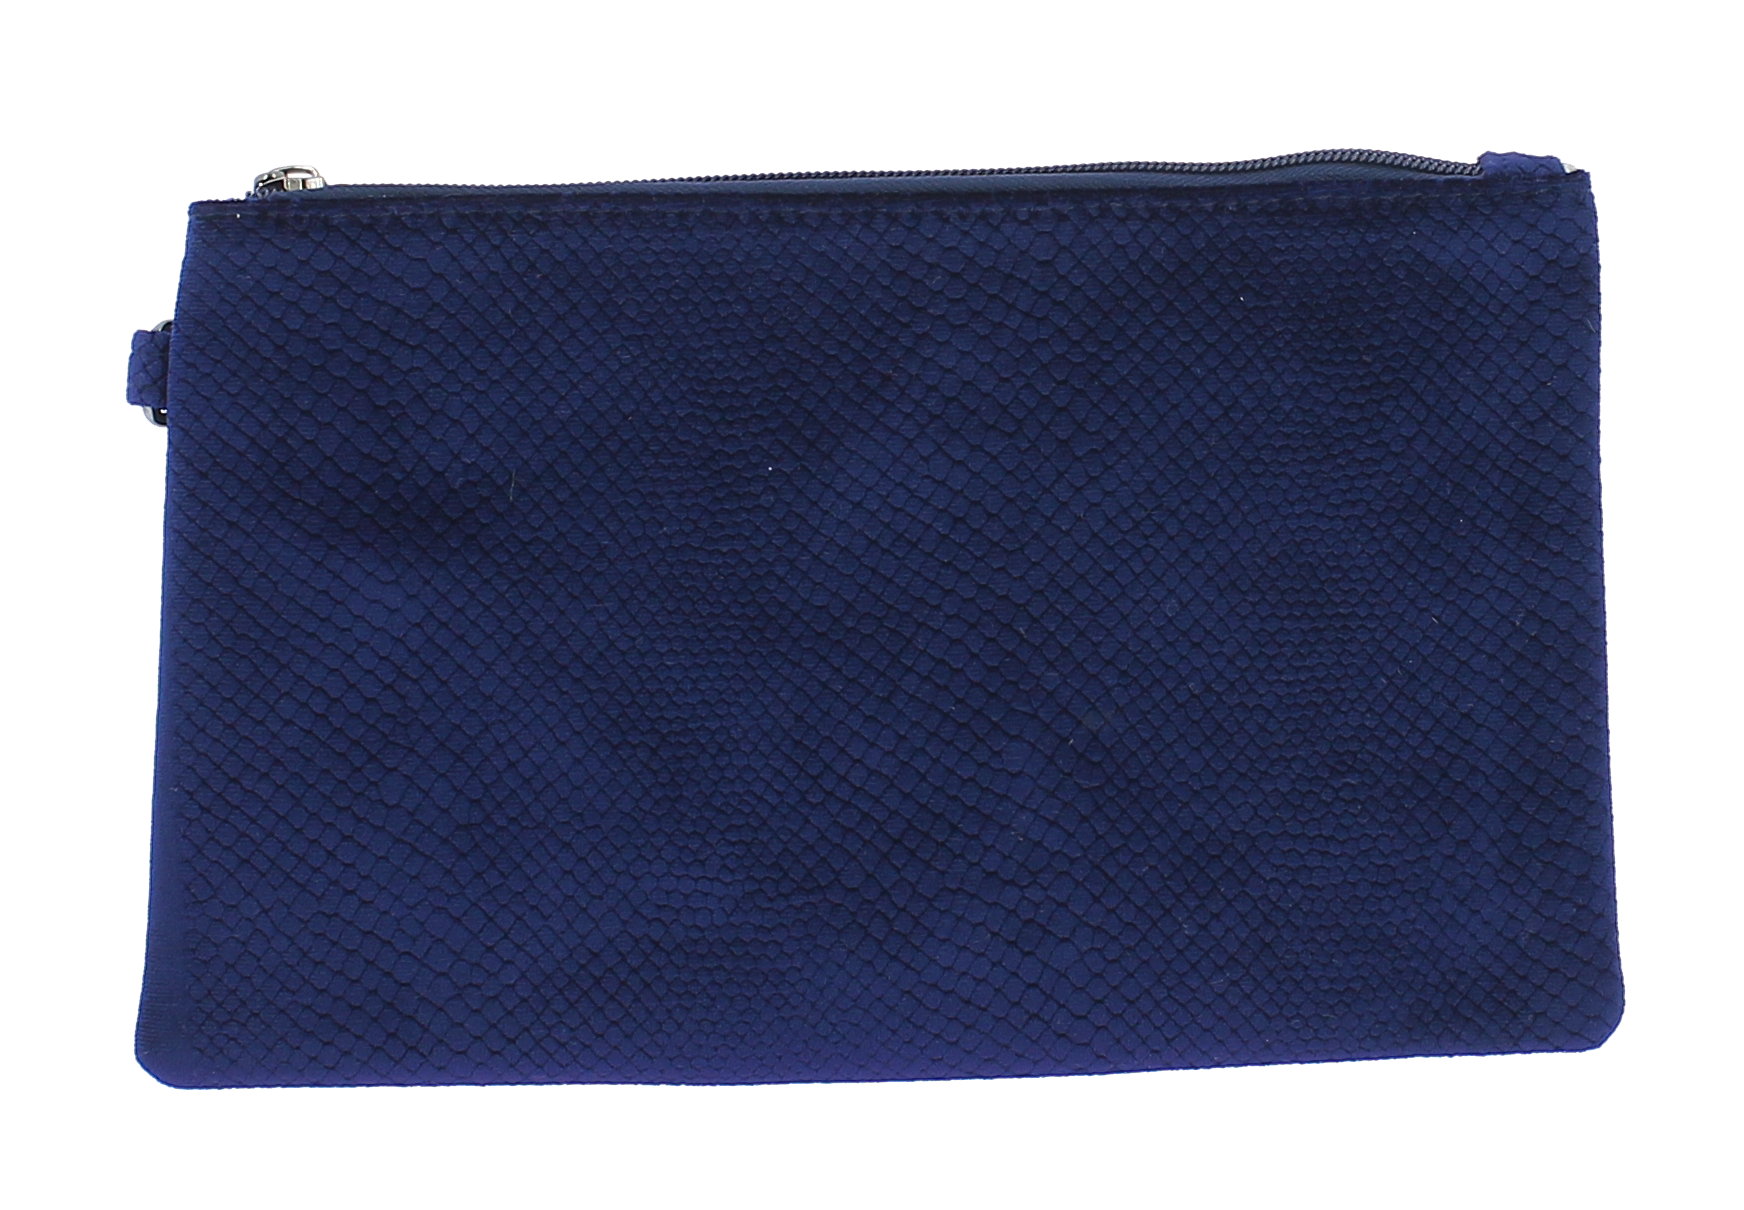 f059b06803 IQBAGS Γυναικείο Τσαντάκι 53011 Μπλε - Pitsiriki.gr